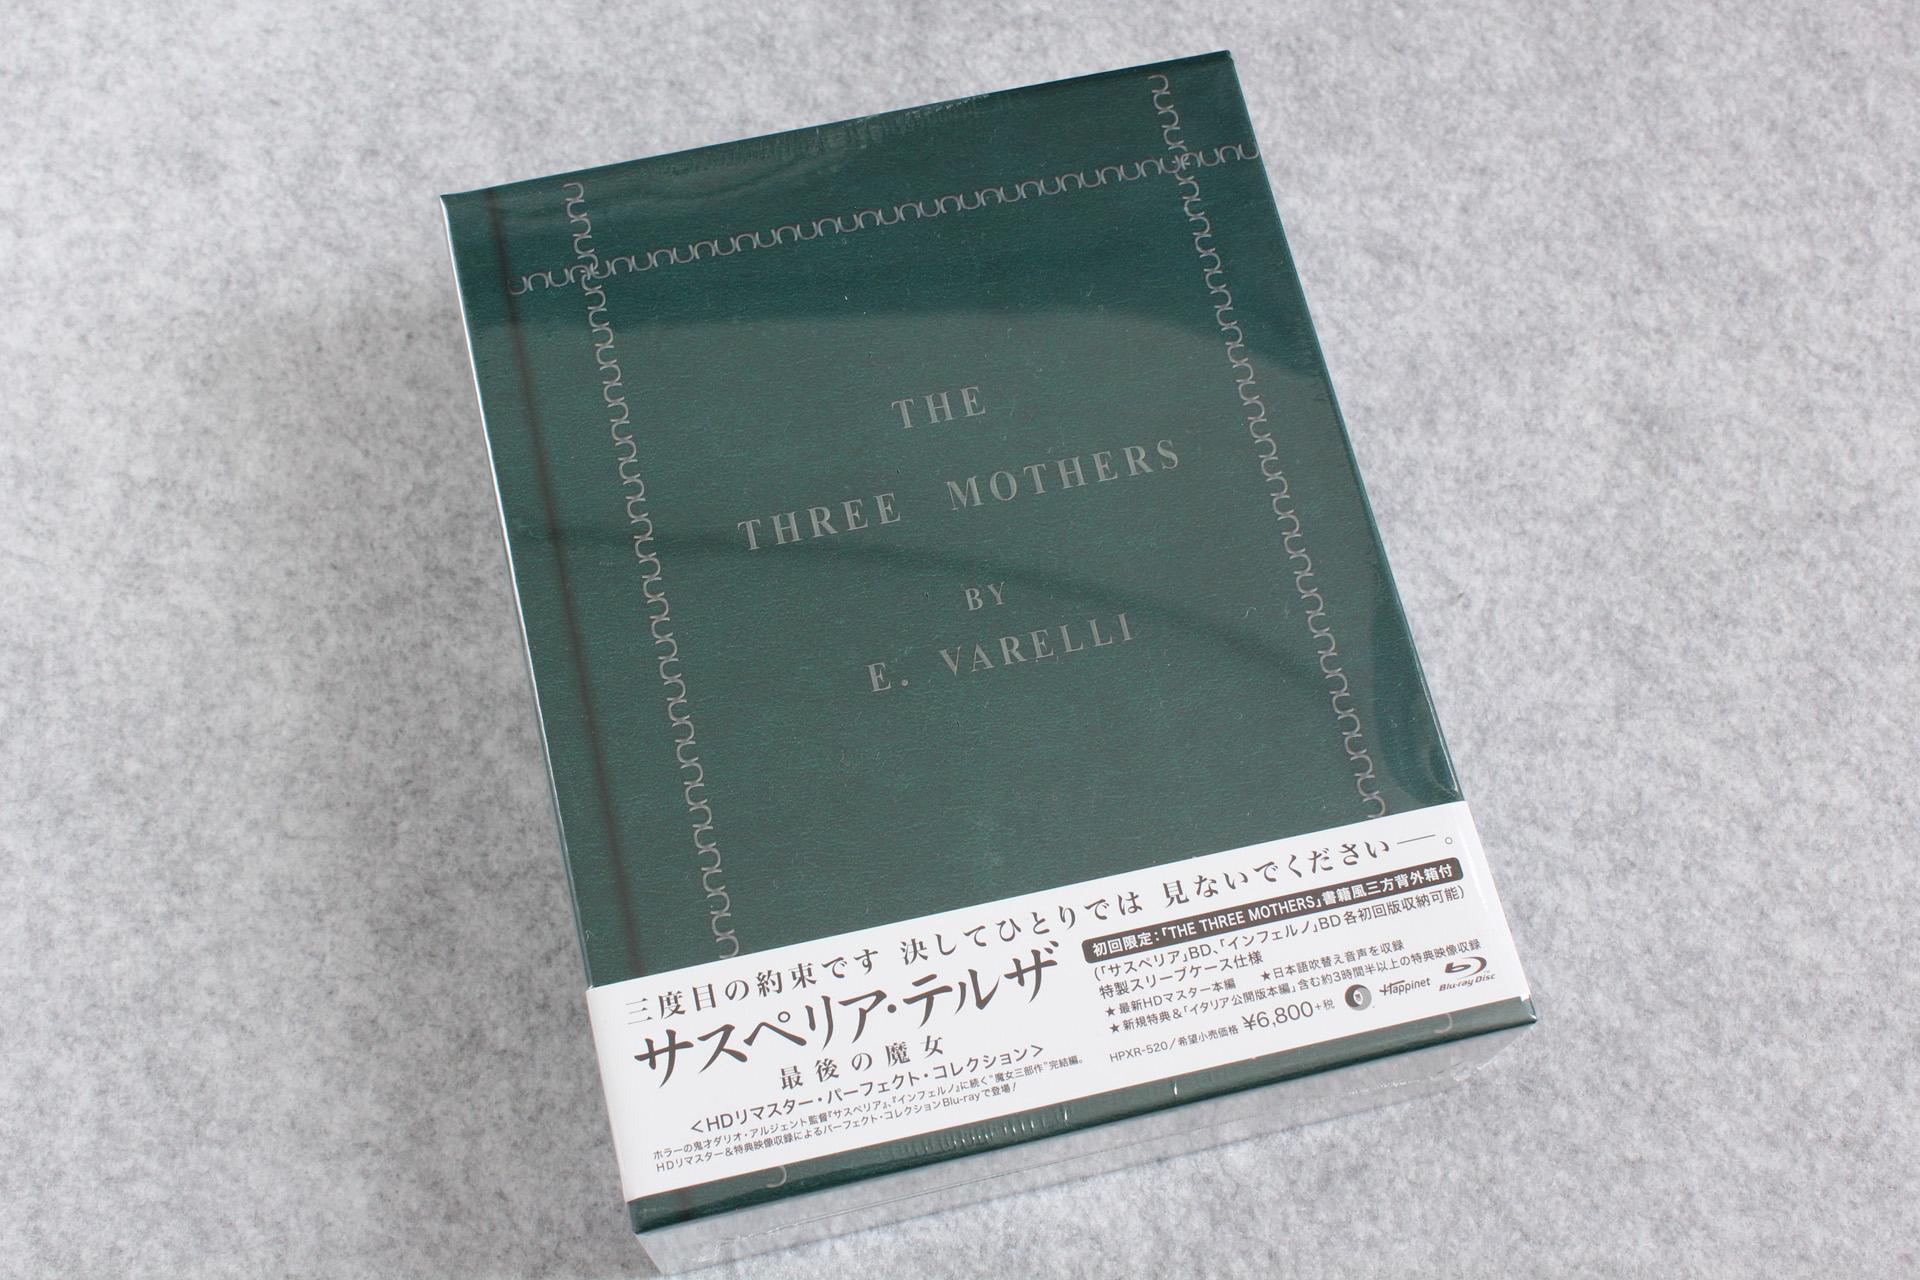 2020-04-01-The_Mother_of_Tears-ZequeBD-01.JPG